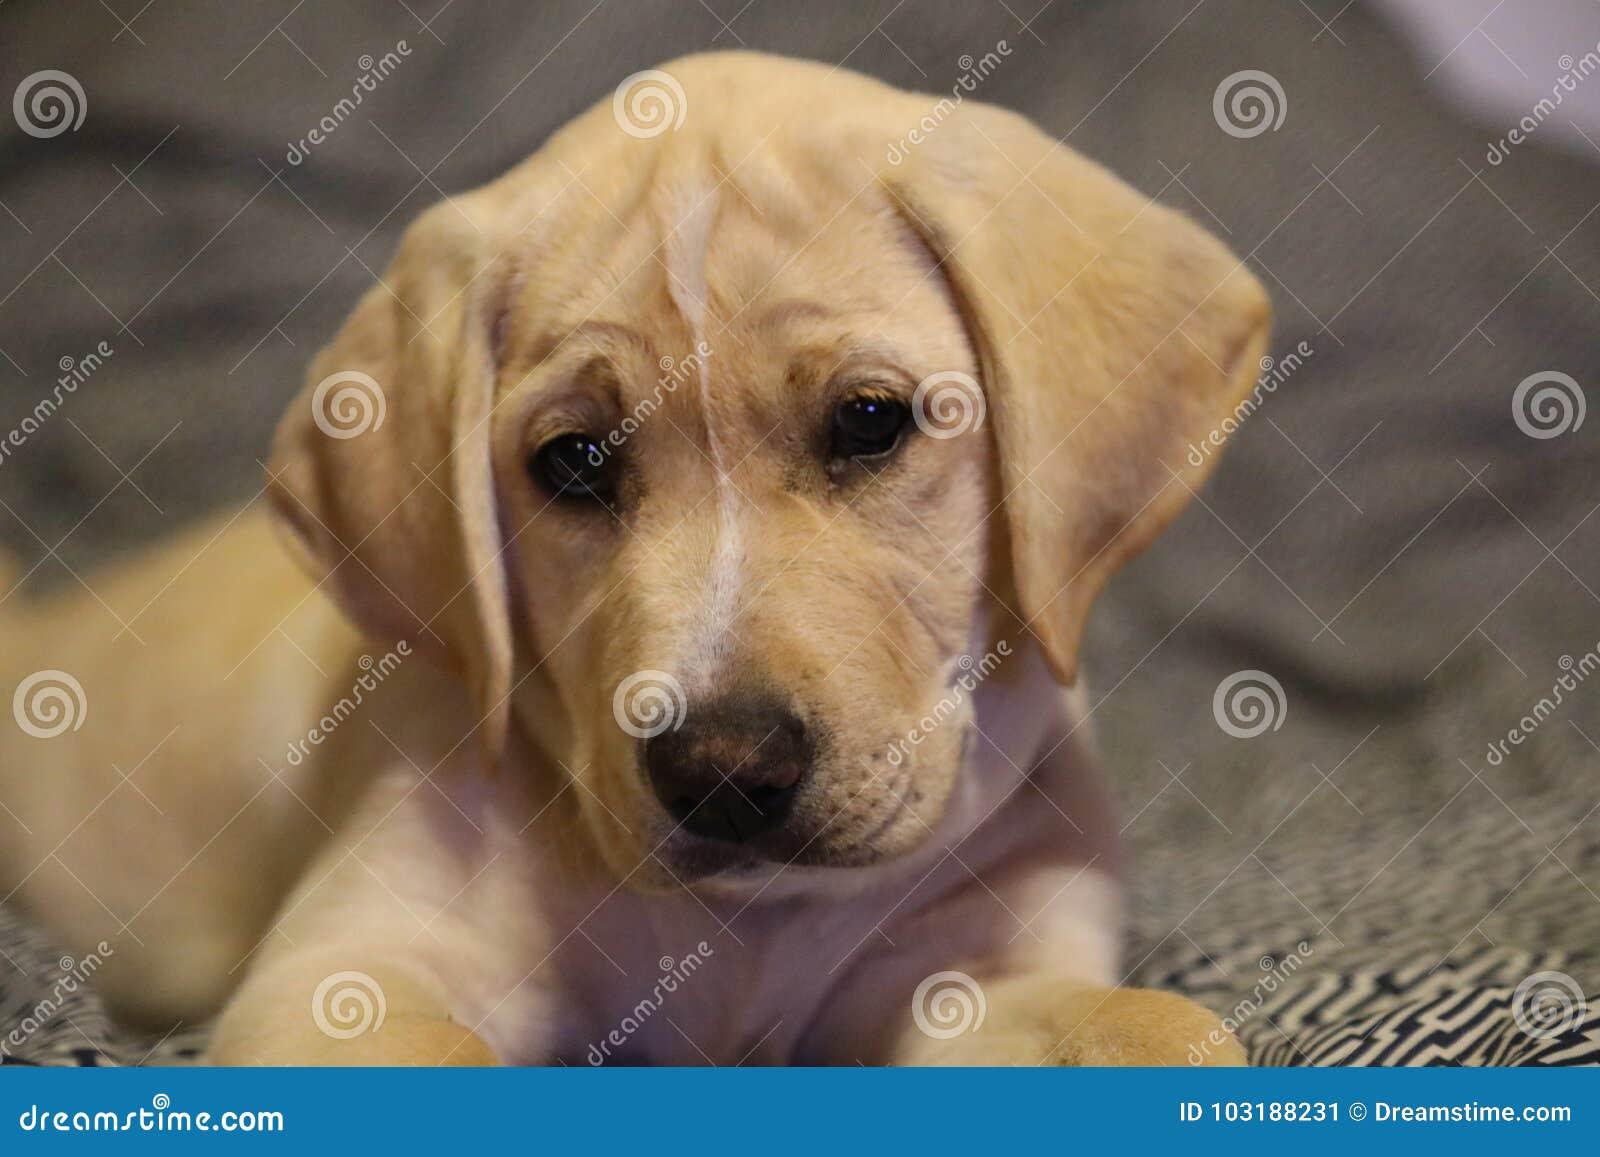 Yellow Lab Puppy Stock Image Image Of Labrador Smiling 103188231